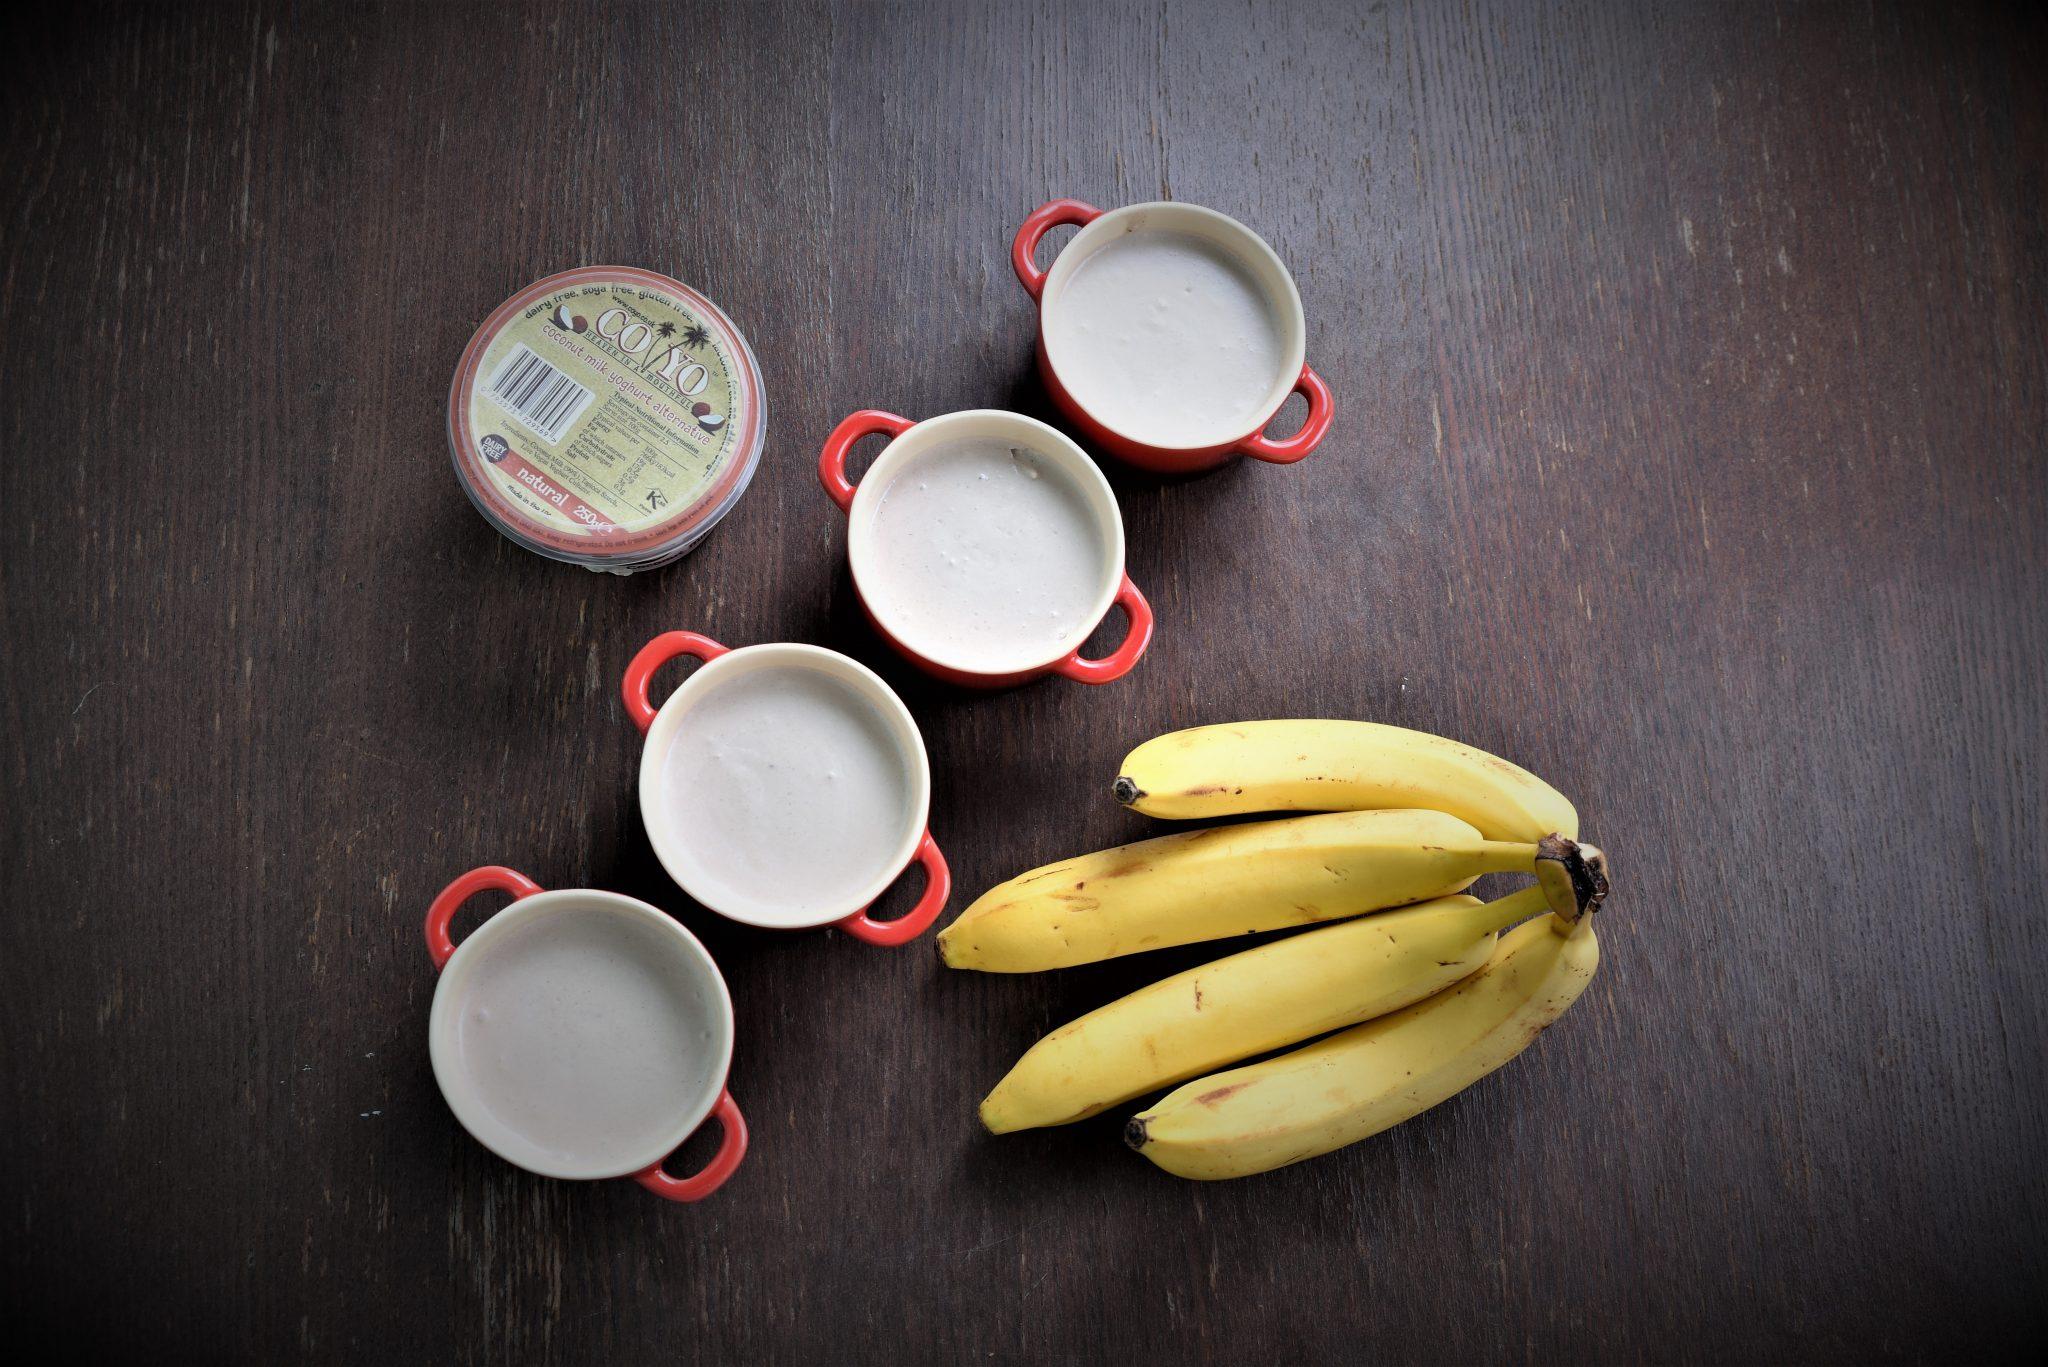 3 ingredient vegan banana and coconut milk yoghurt mousse birds eye